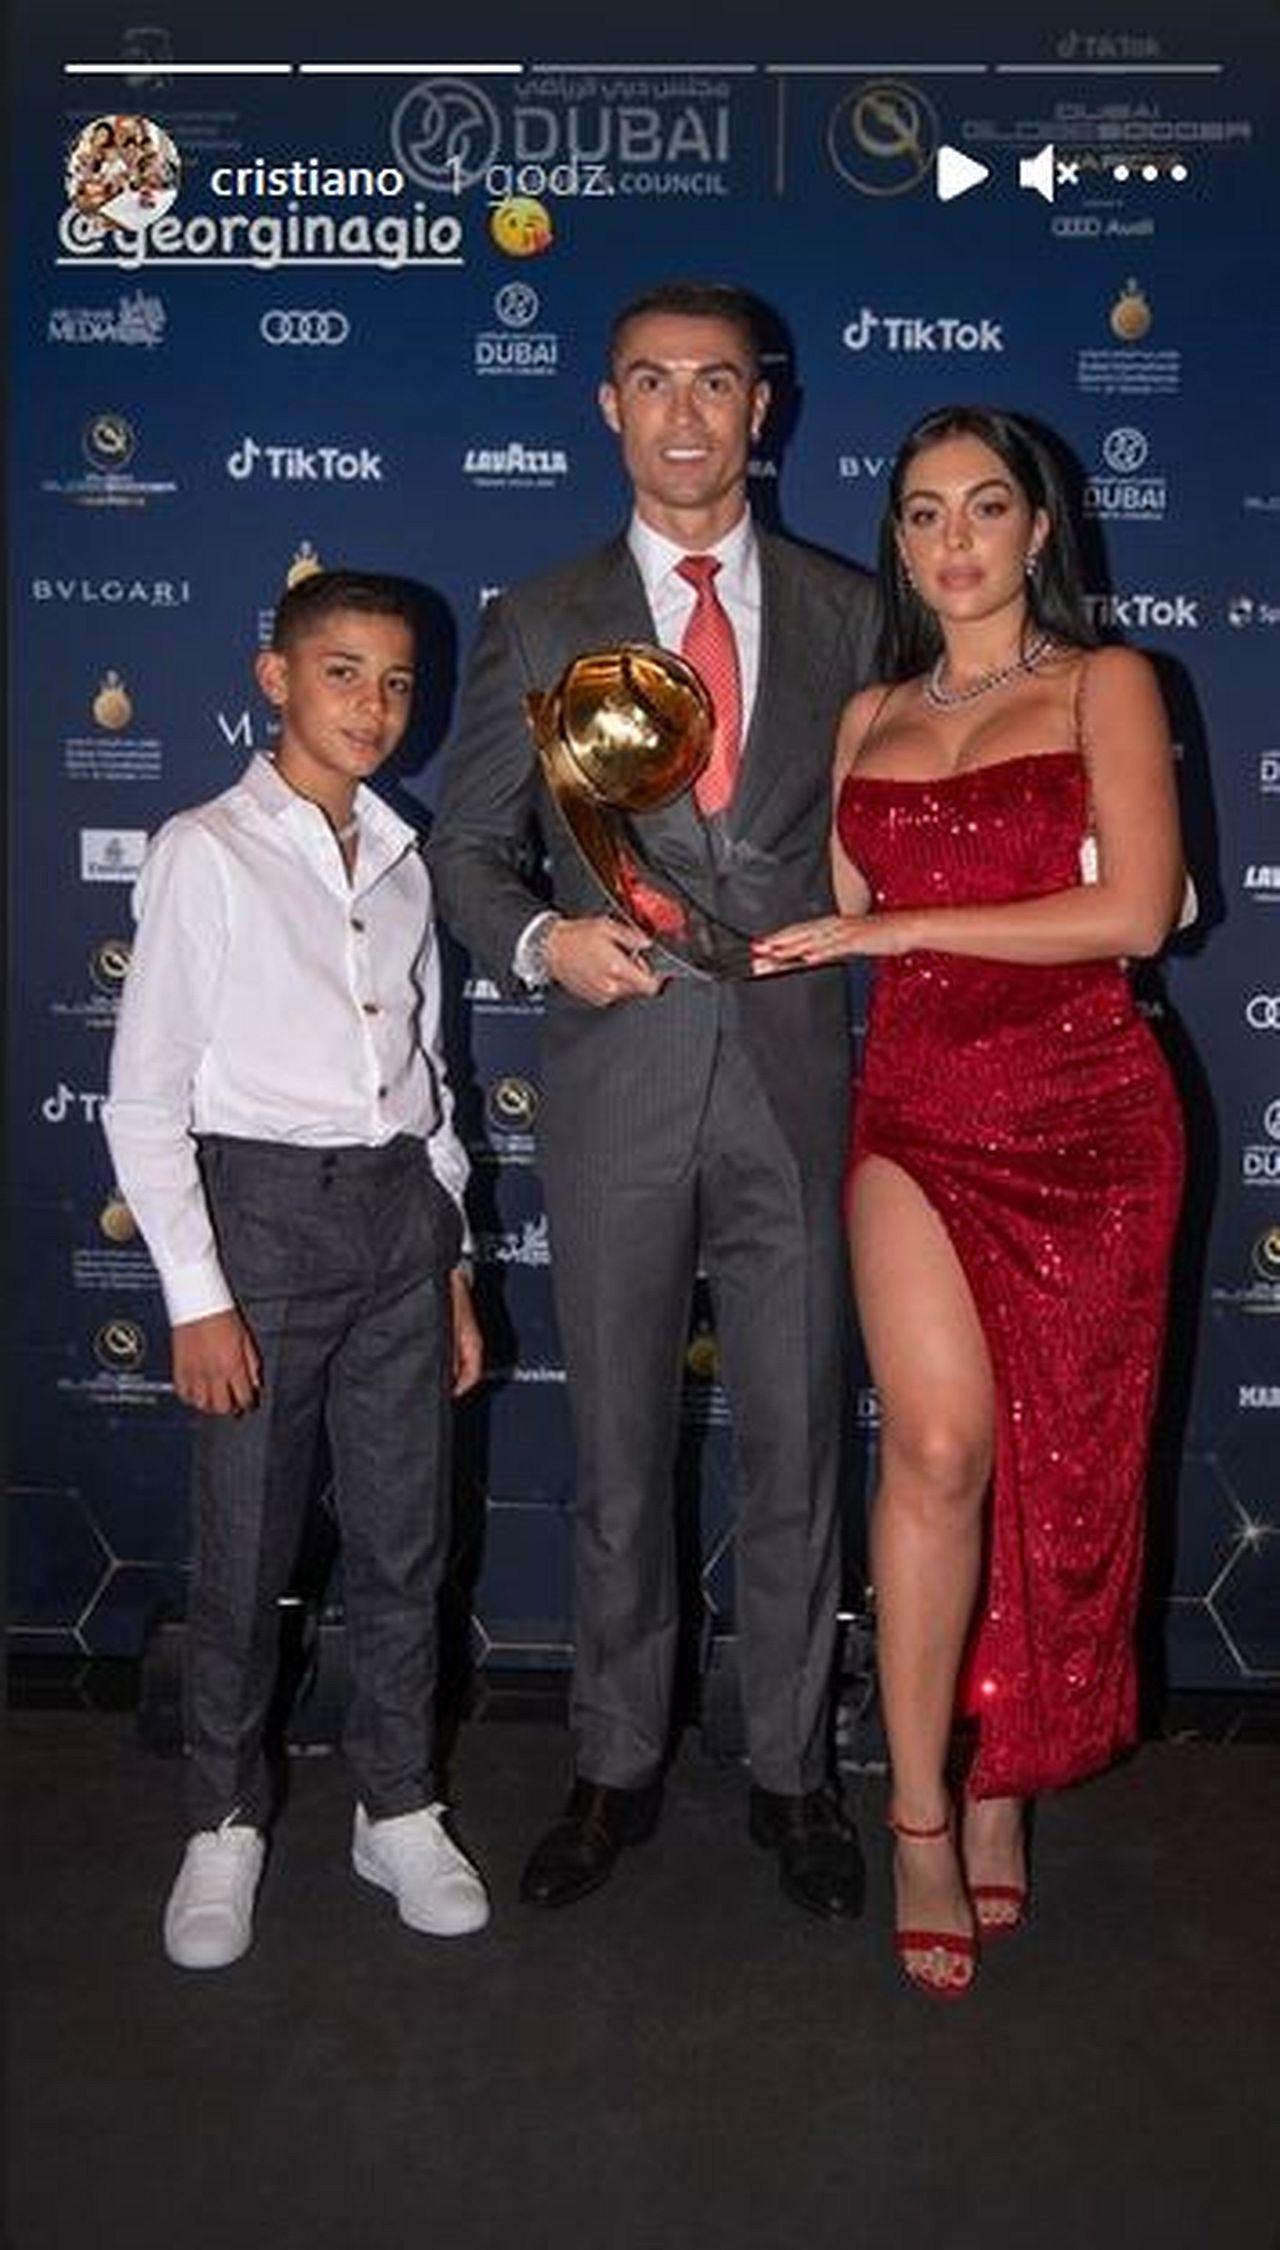 Cristiano Ronaldo z Georginą Rodriguez i synem na gali Globe Soccer Awards